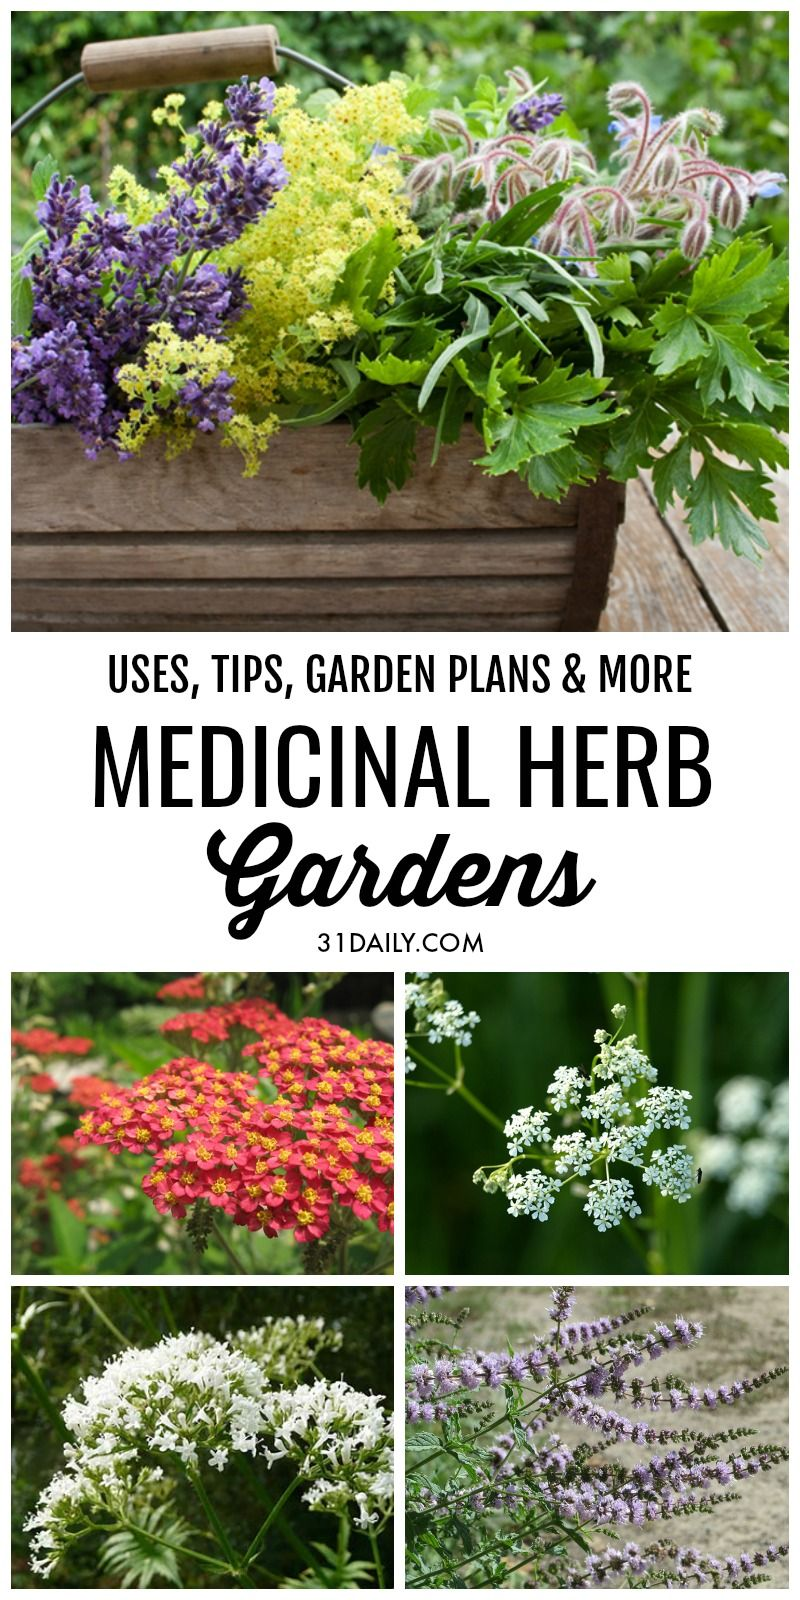 Medicinal Herb Gardens Series Gardening Vegetable And Kitchen